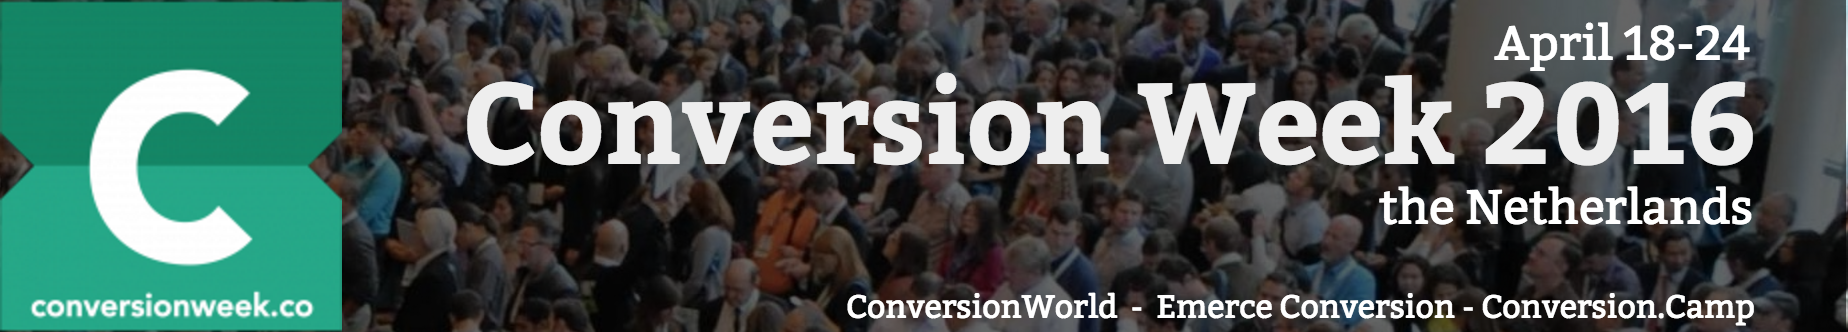 ConversionWeek